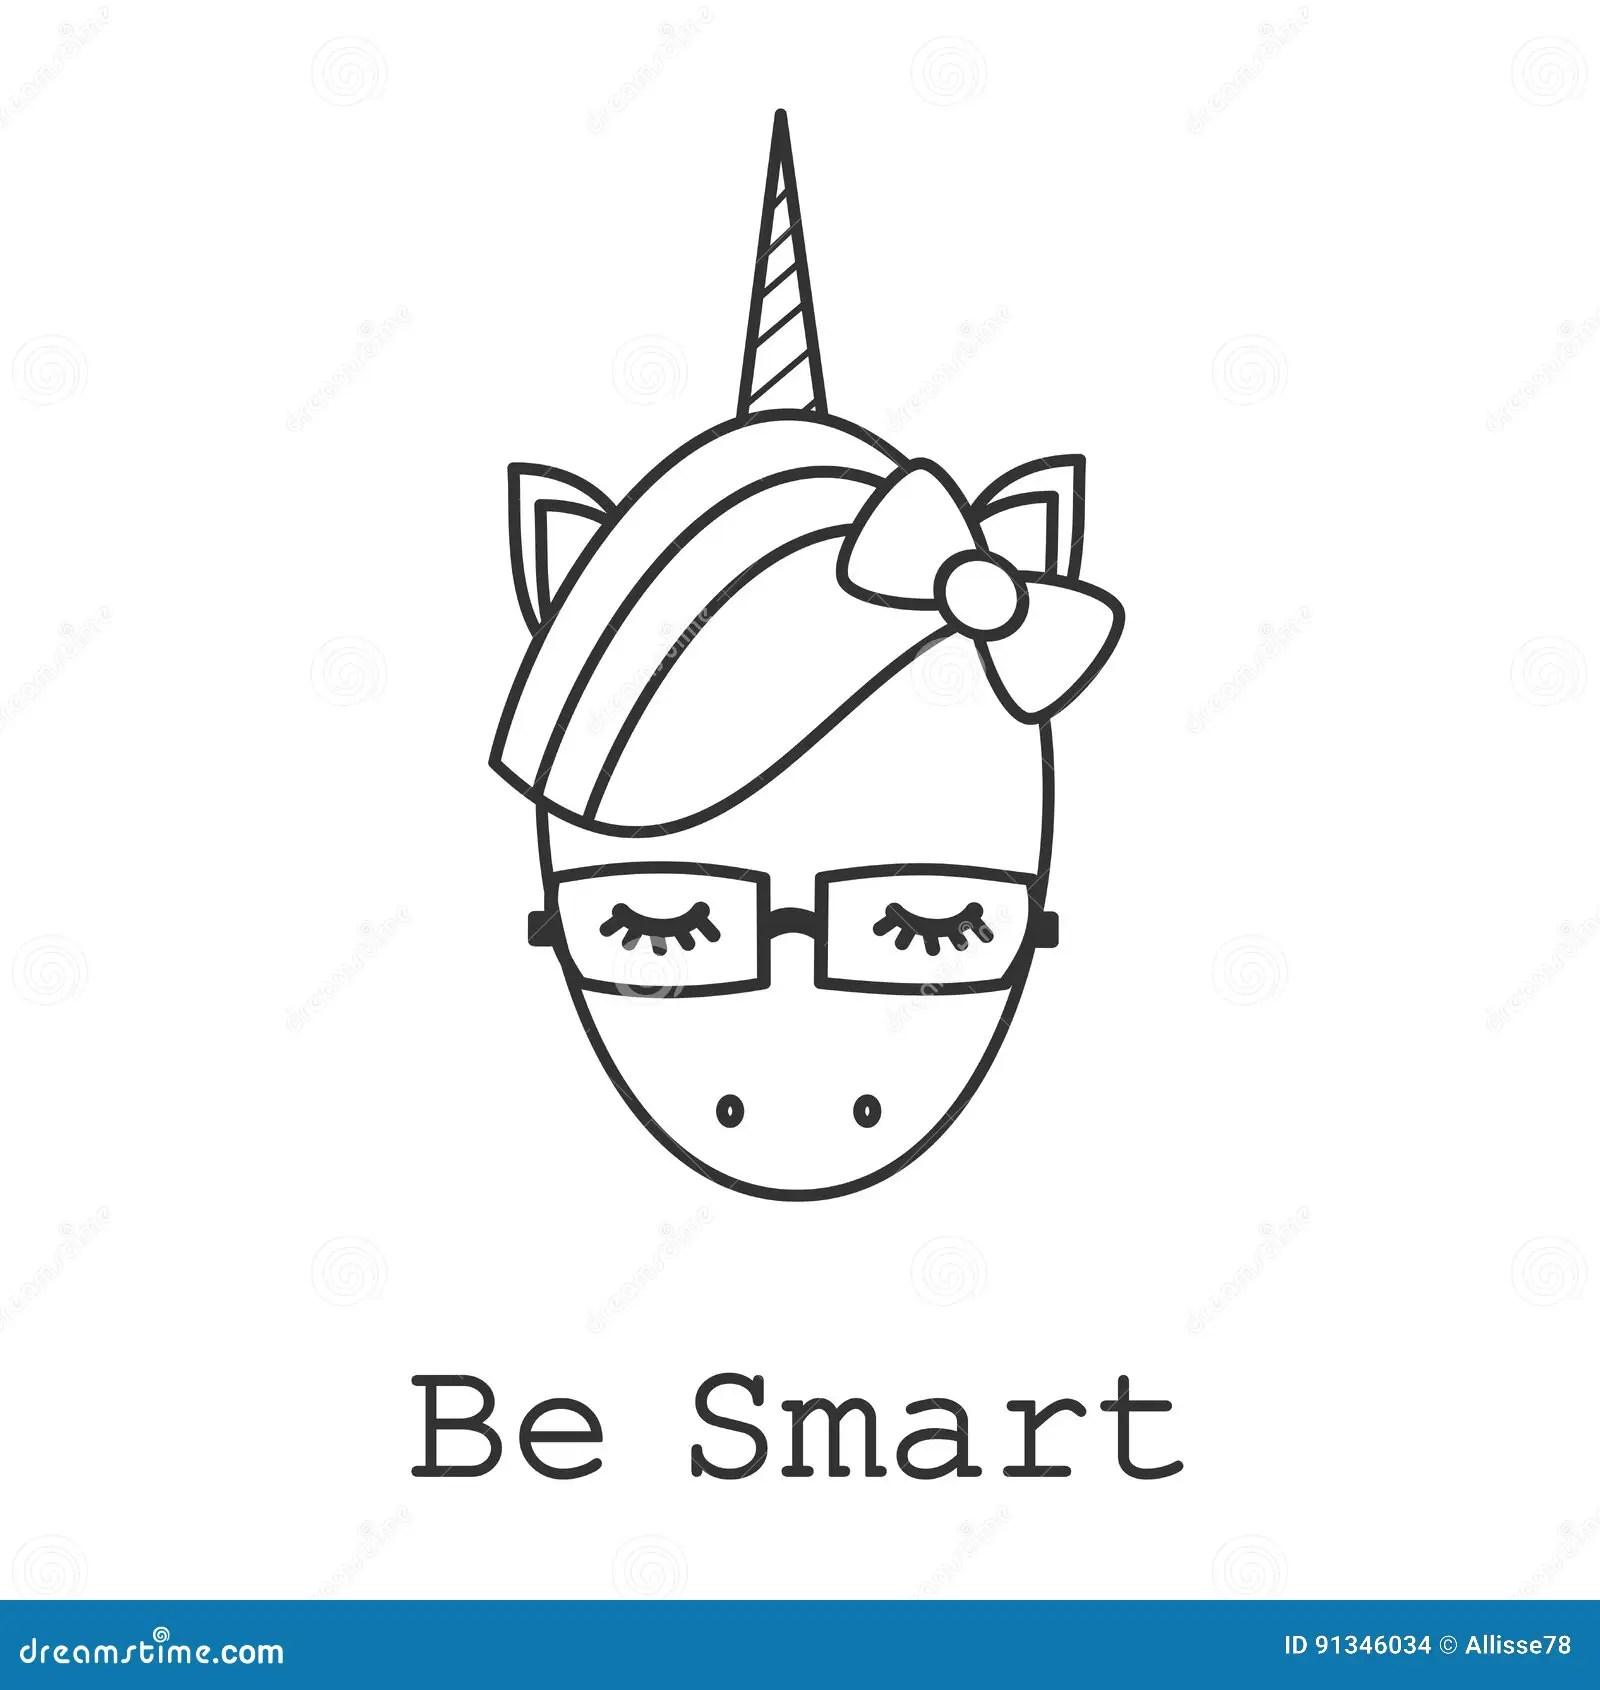 Be Smart Motivational Slogan Card With Cute Cartoon Black